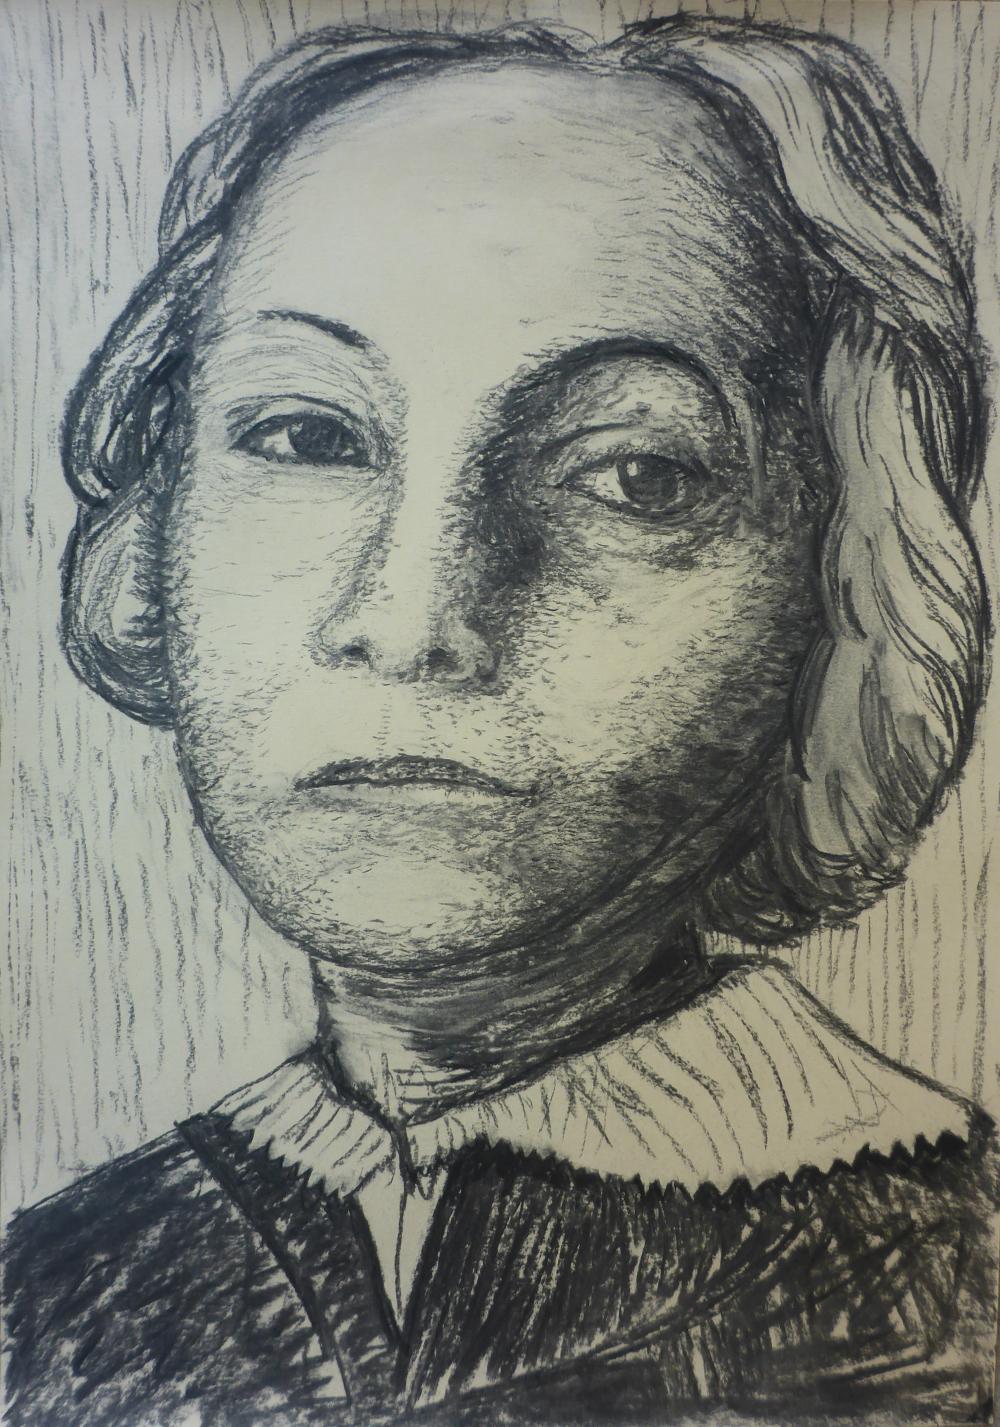 """Käthe"", 2019, charcoal on paper, 42 x 59 cm"